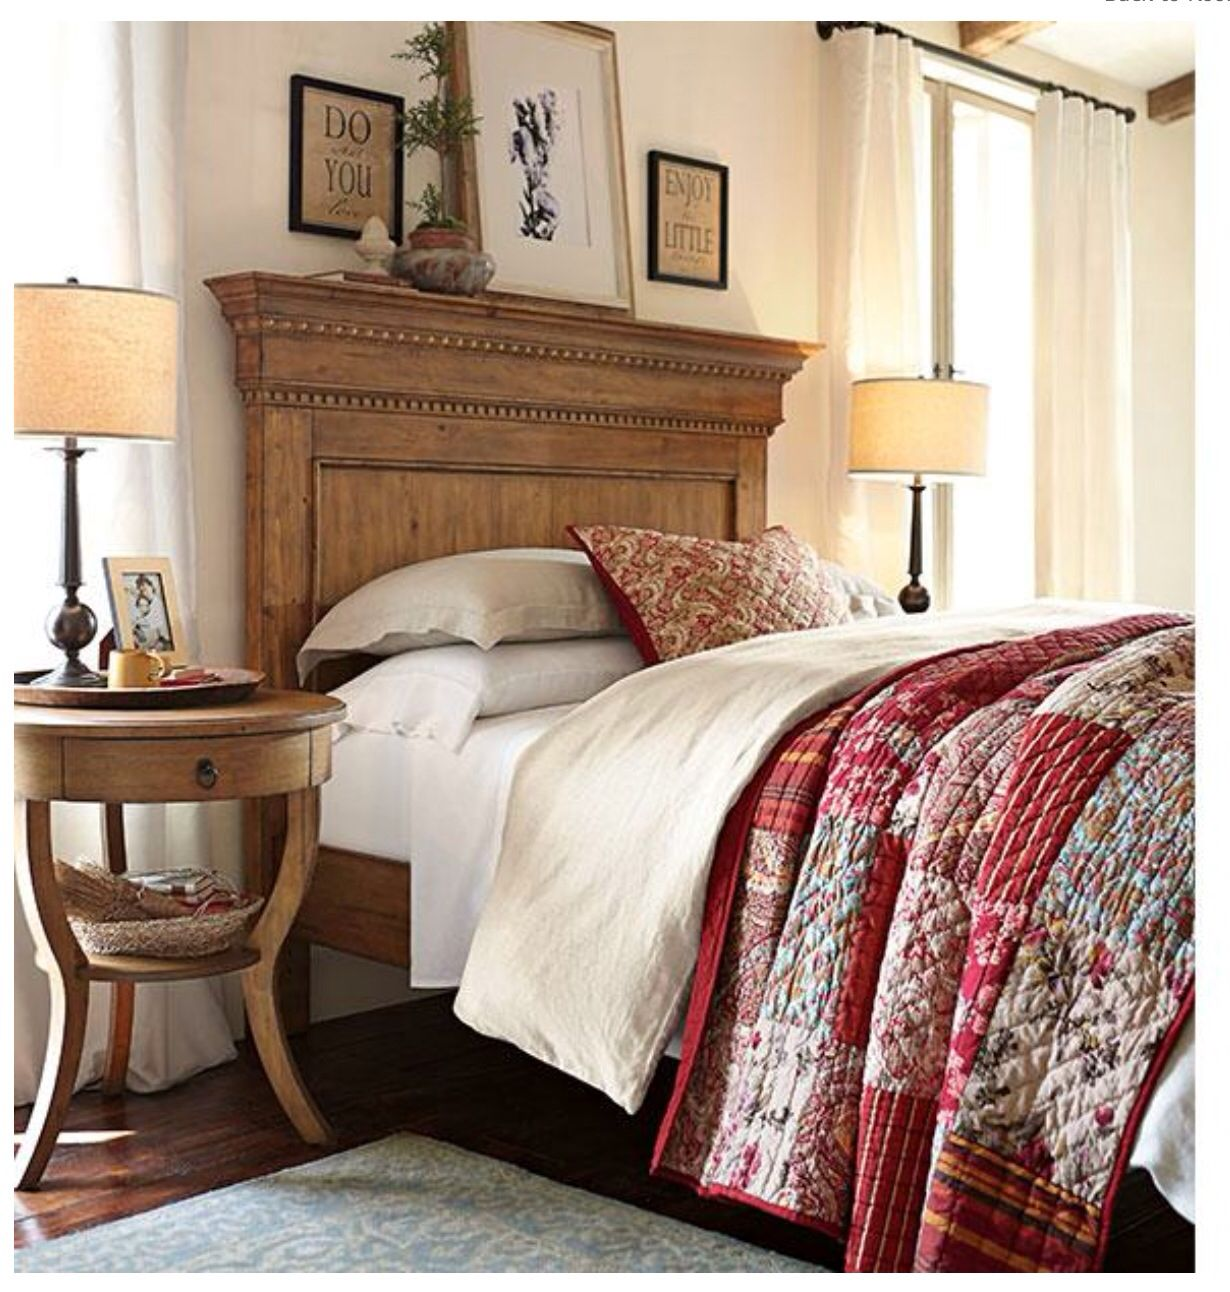 Pottery barn Bed!!! Pottery barn bedrooms, Bedroom decor